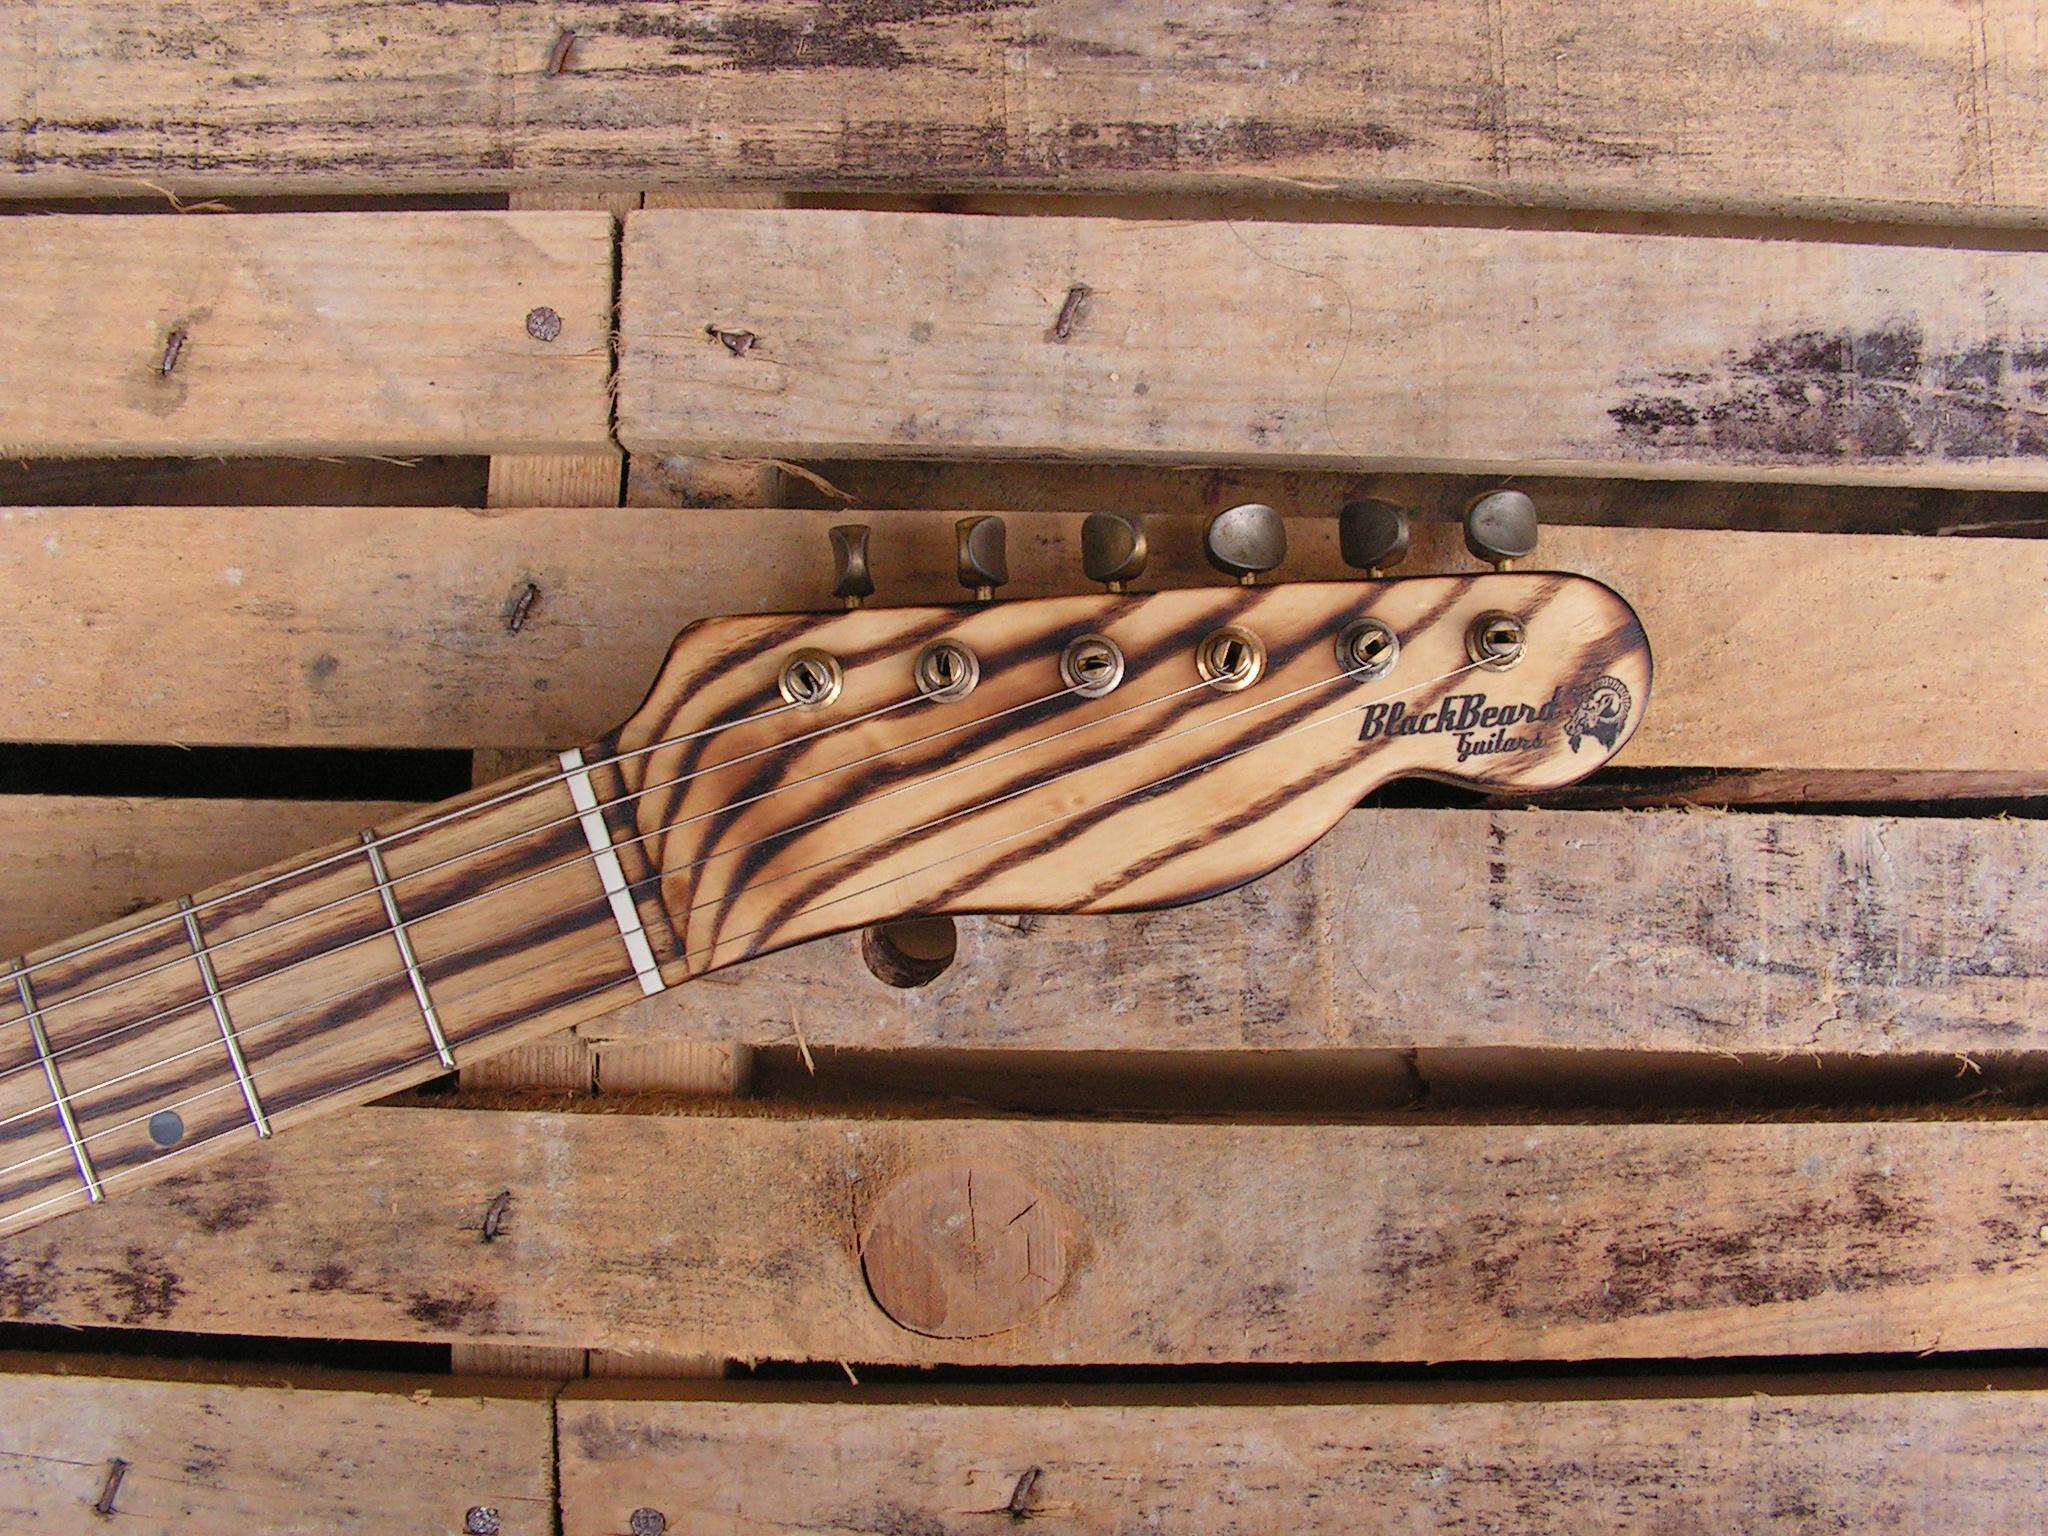 Paletta in frassino di una chitarra elettrica telecaster in pino